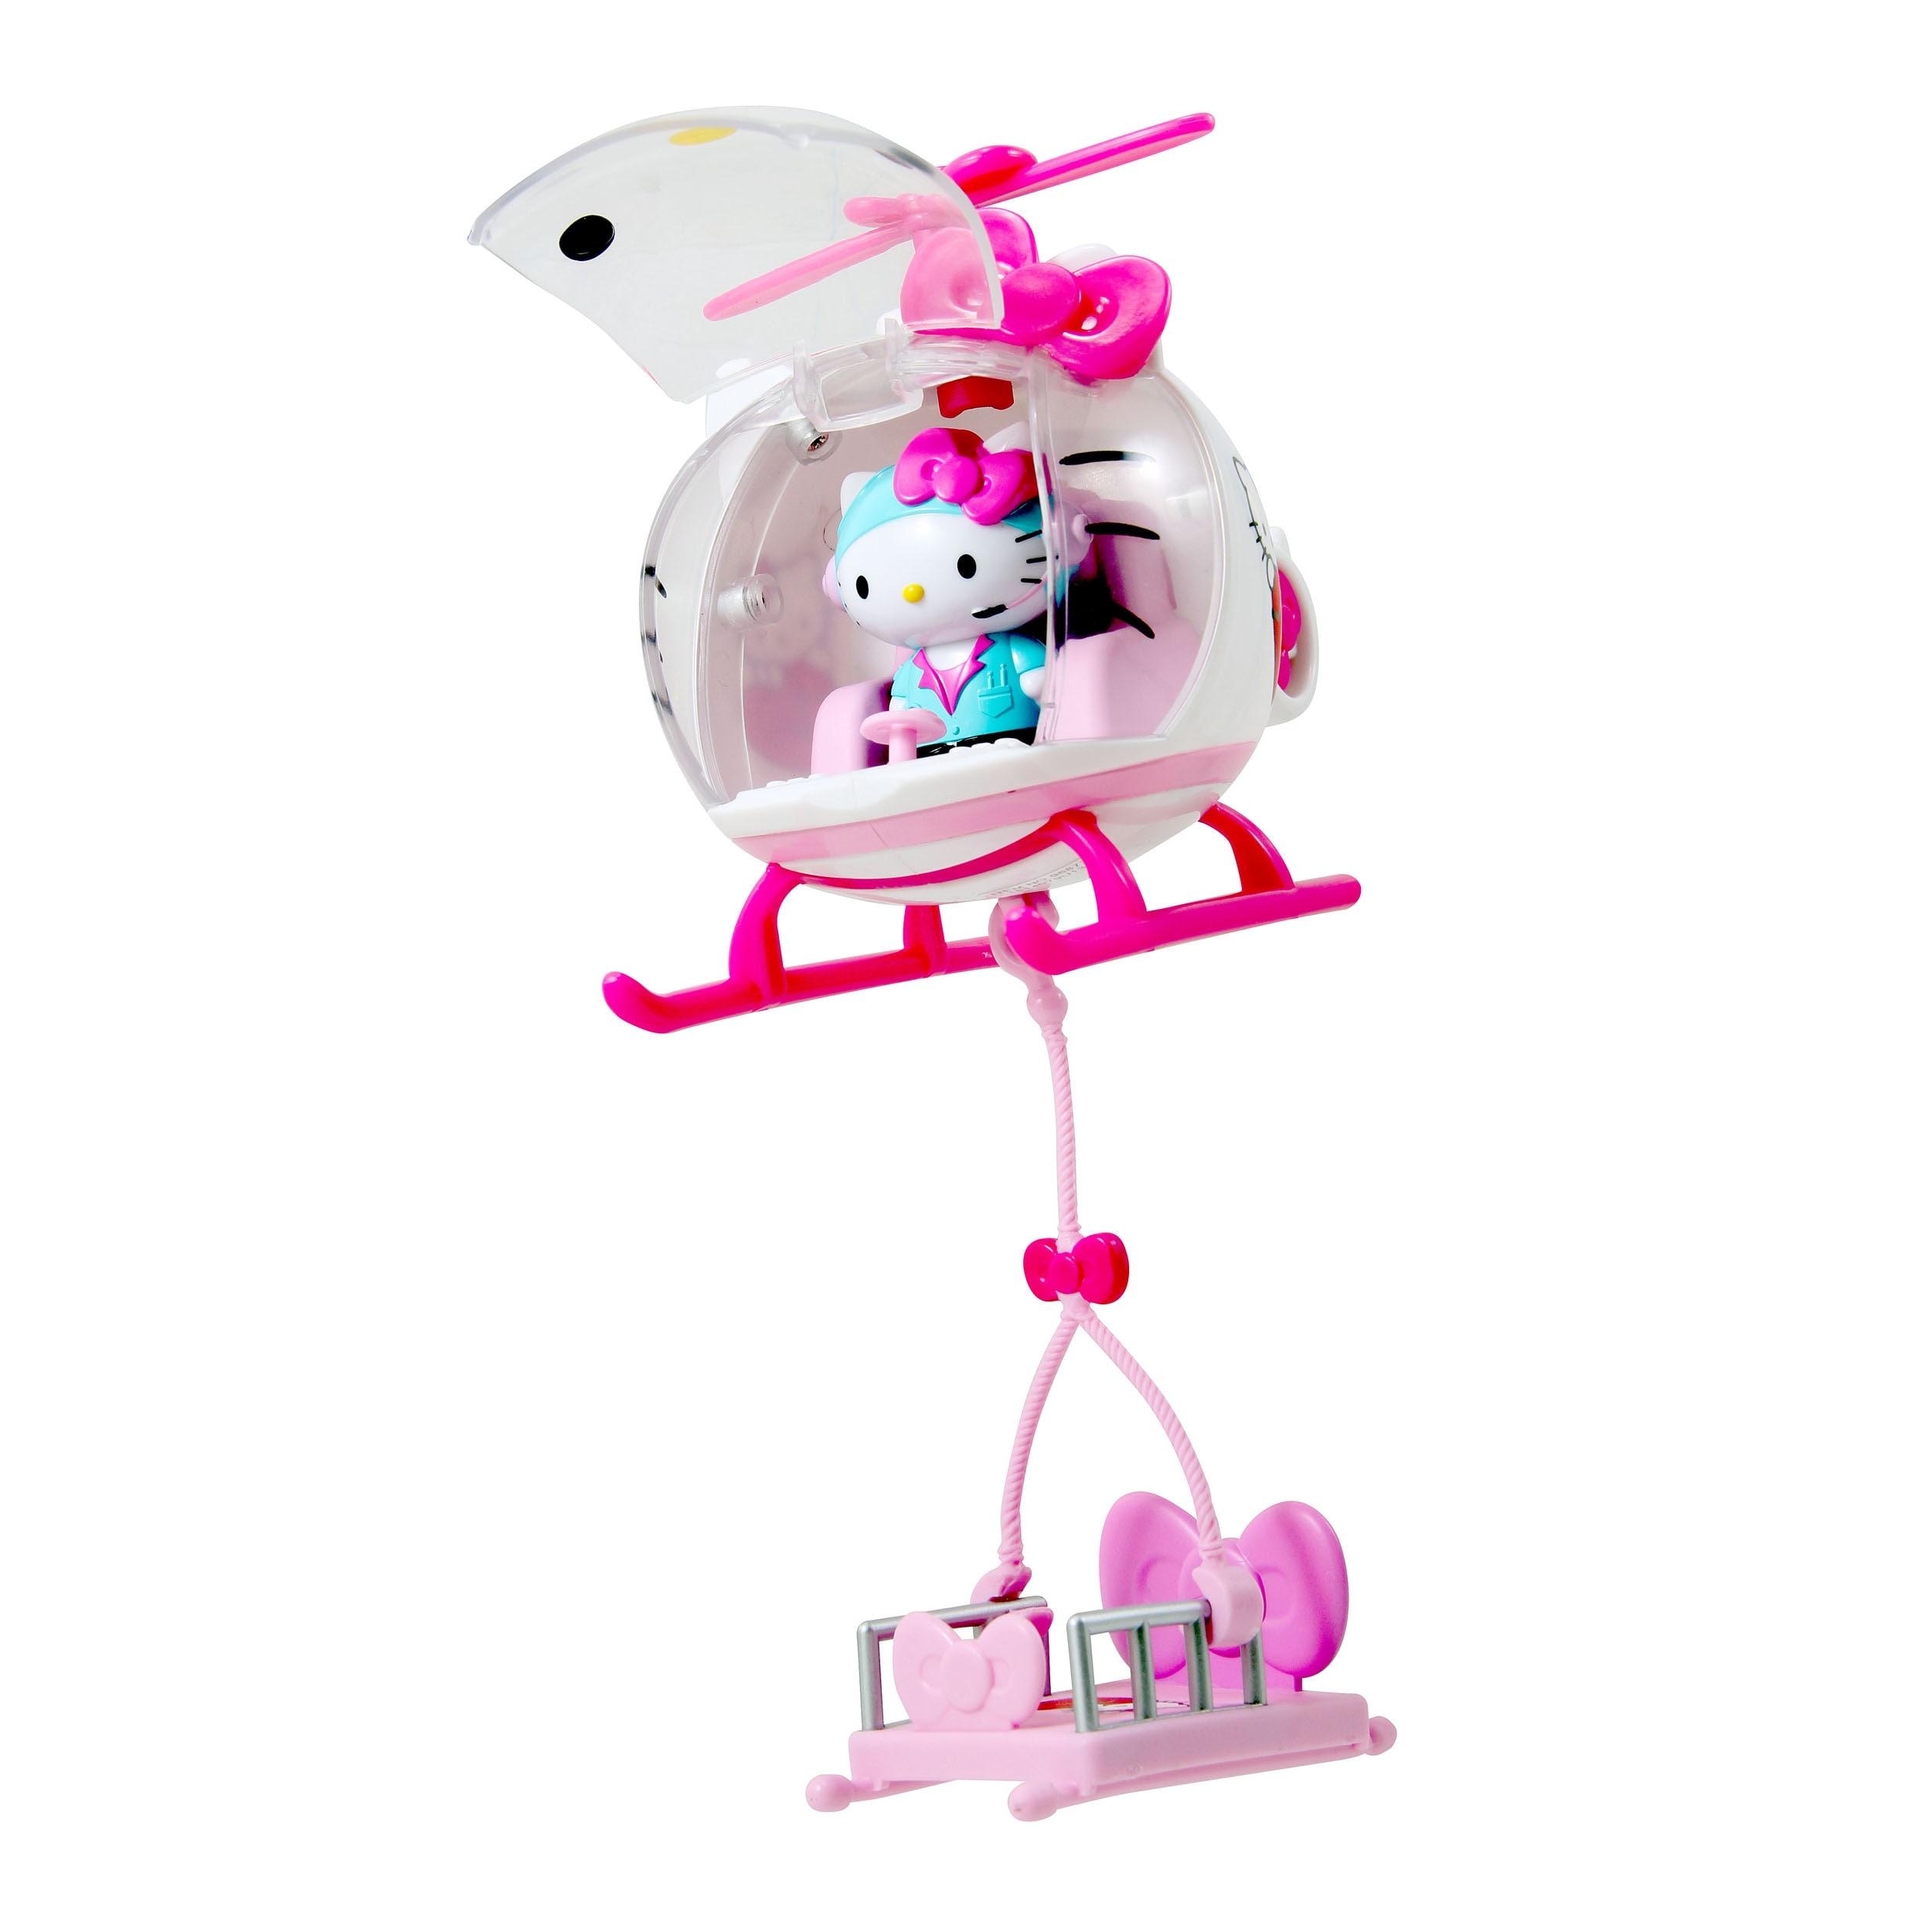 Jada Toys Hello Kitty Emergency Helicopter (1)